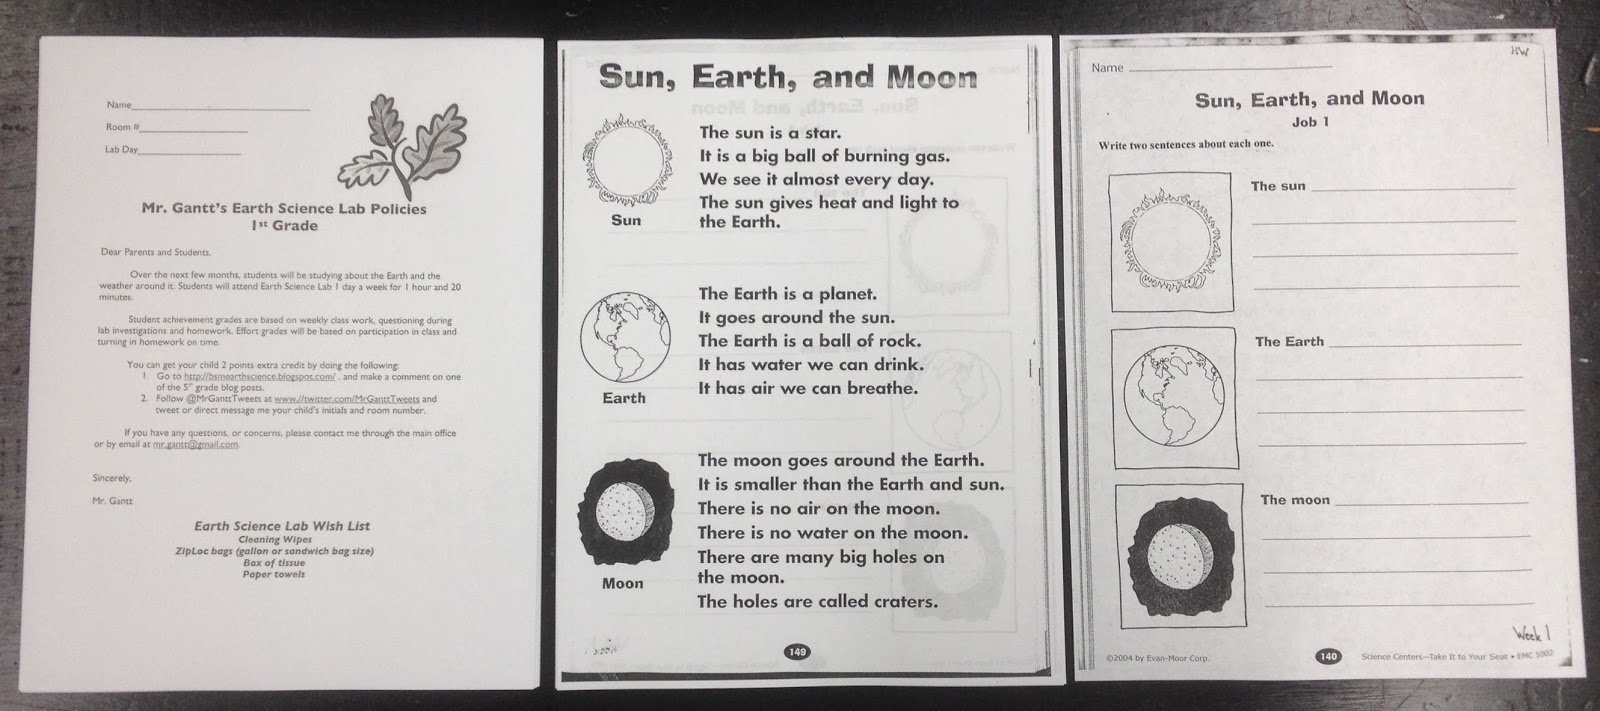 mr gantt 39 s earth science lab blog 1st grade week 1 sun earth moon. Black Bedroom Furniture Sets. Home Design Ideas